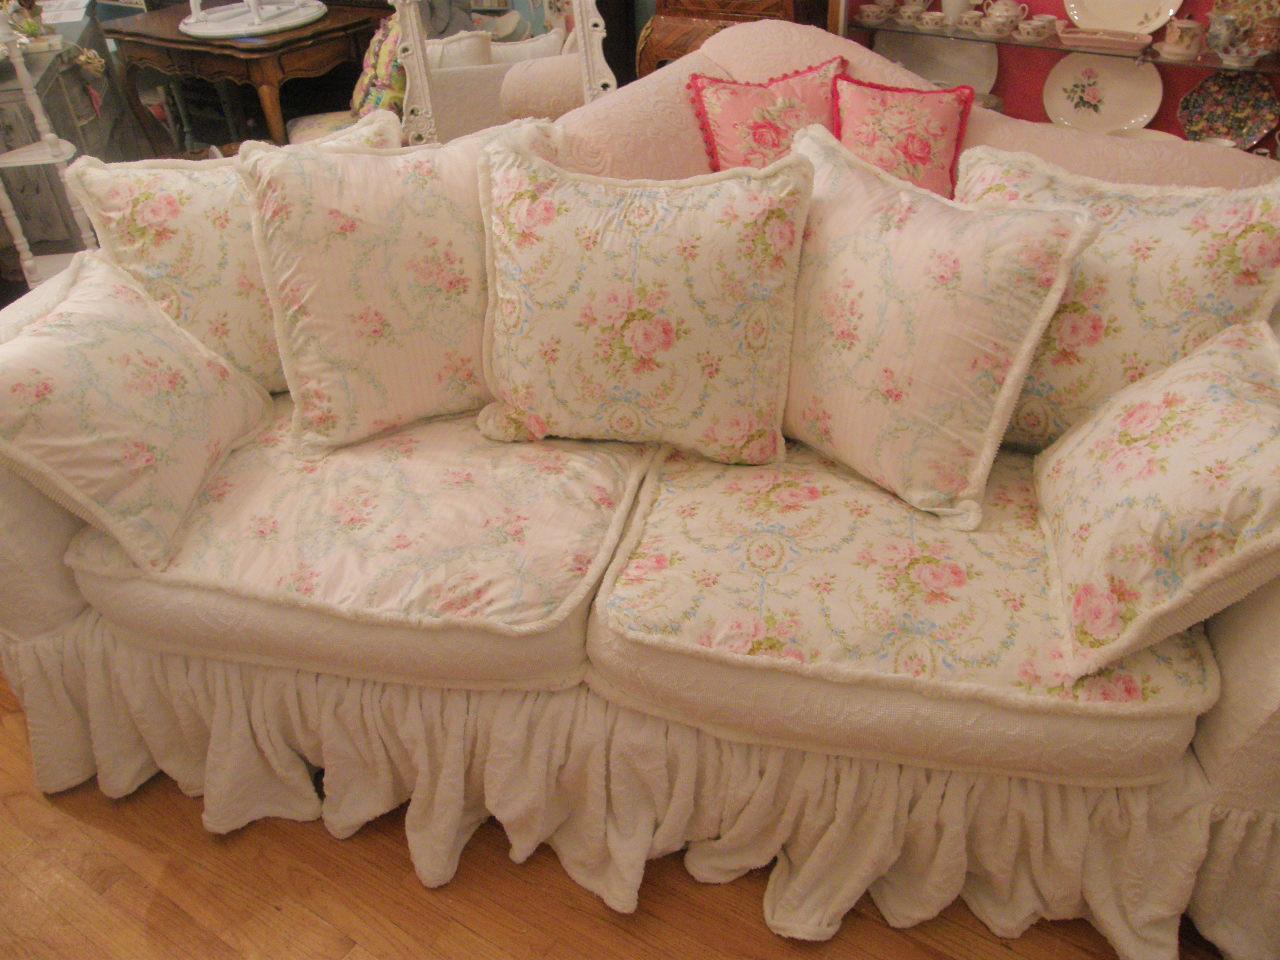 Vintage Chic Furniture Schenectady NY: Shabby Chic ...